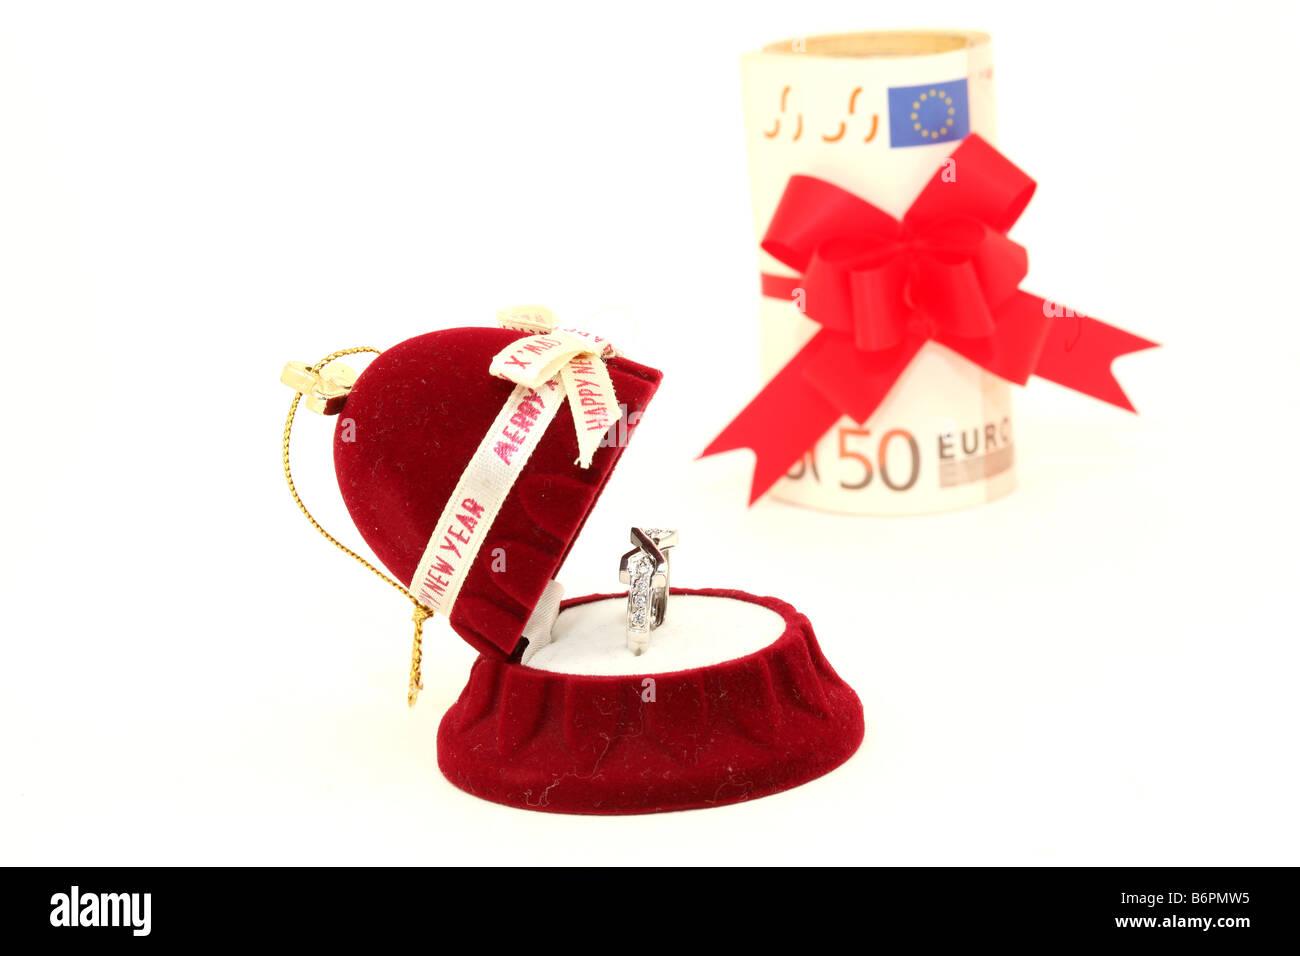 xmas gift box with white gold ring and euro money background isolated - Stock Image